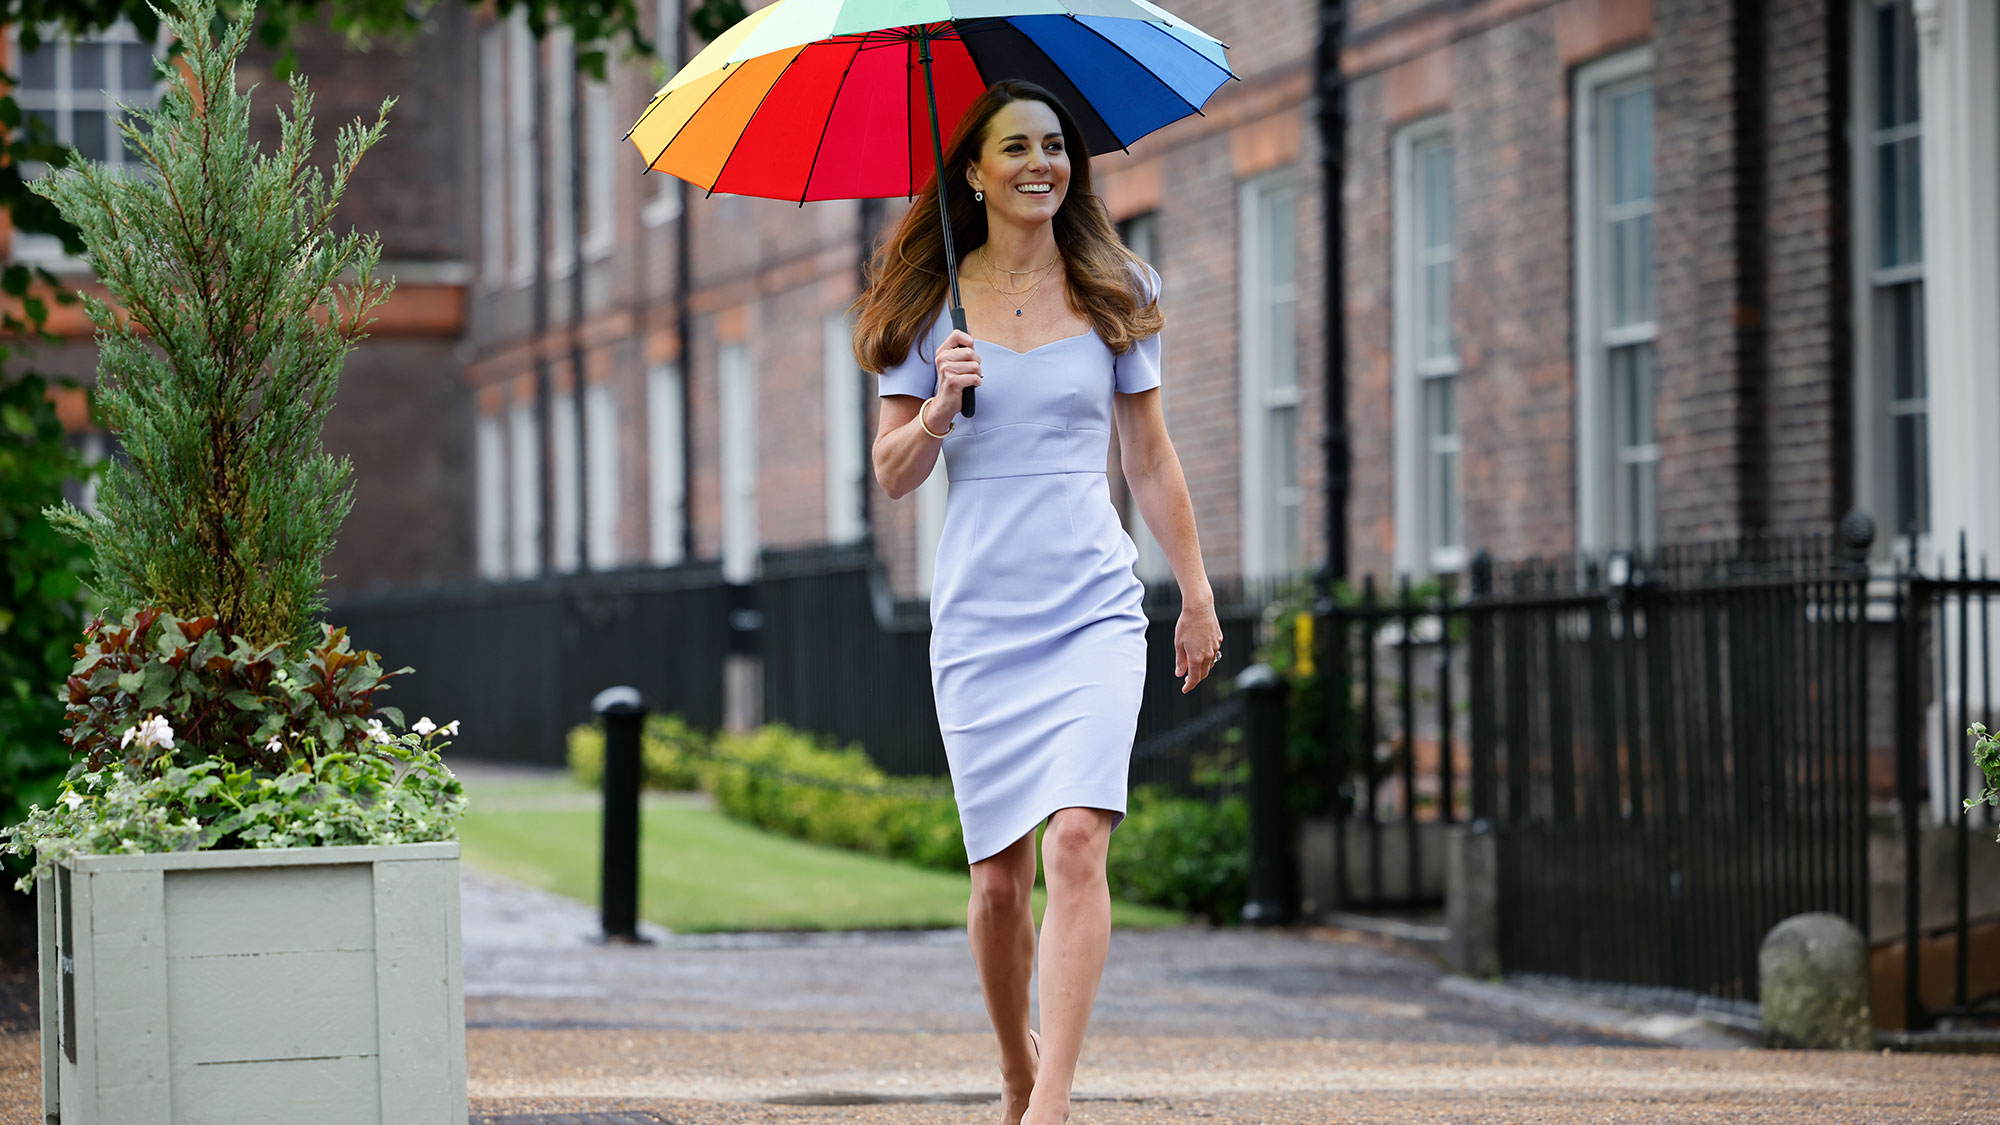 Kate Middleton often wears this colour for this reason